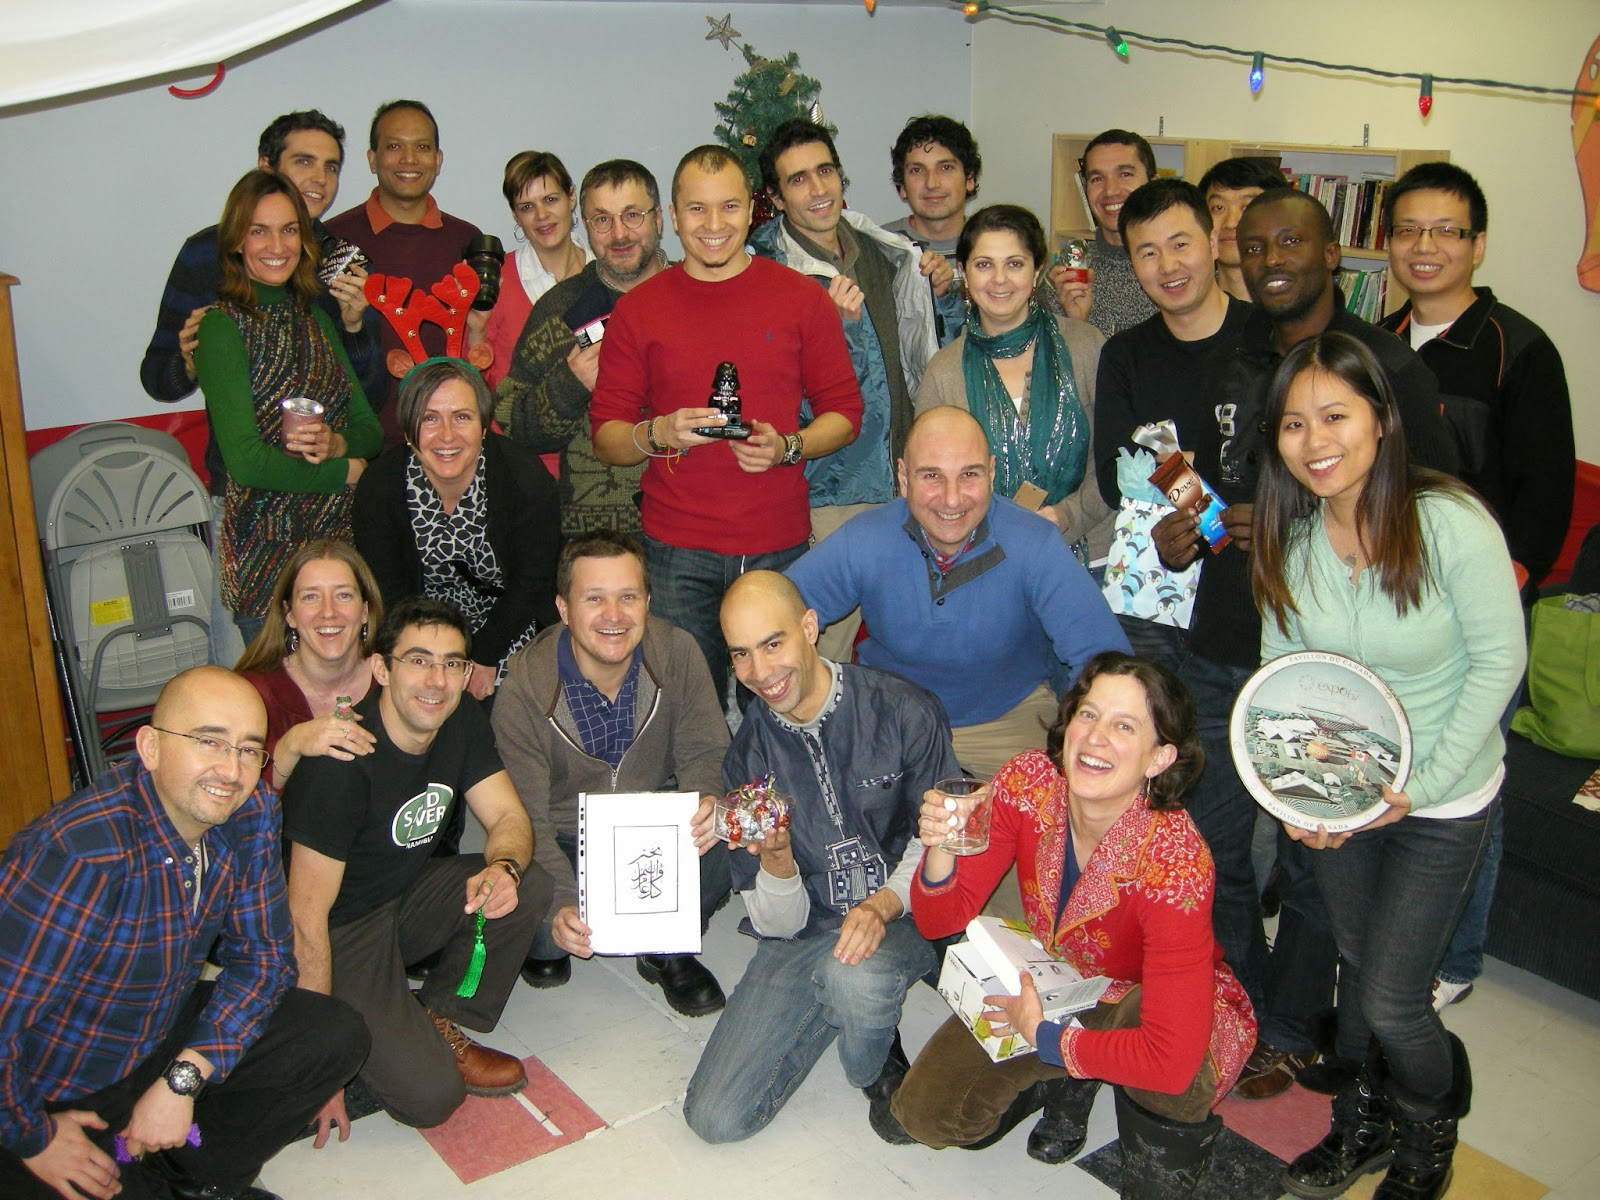 semaine des rencontres interculturelles 2013